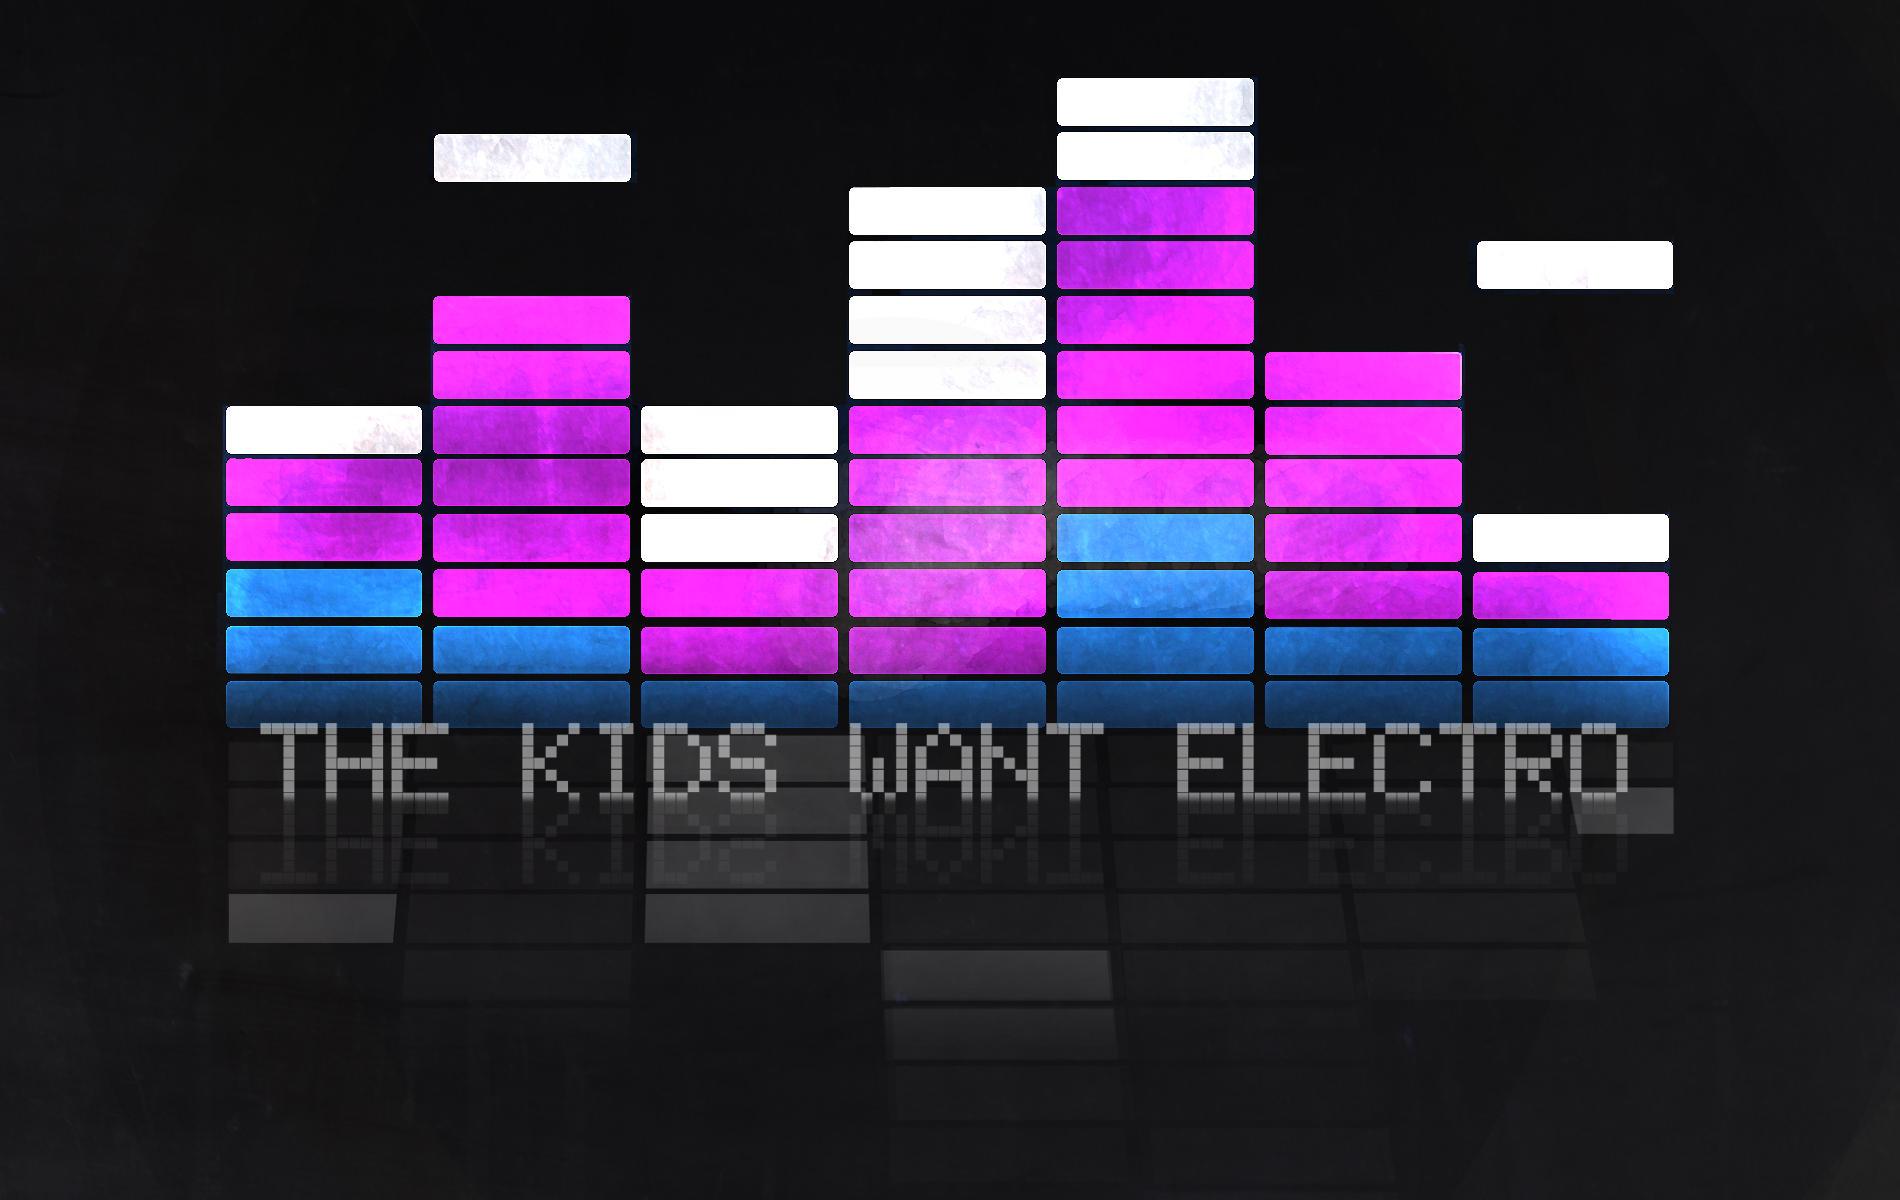 electro wallpaper